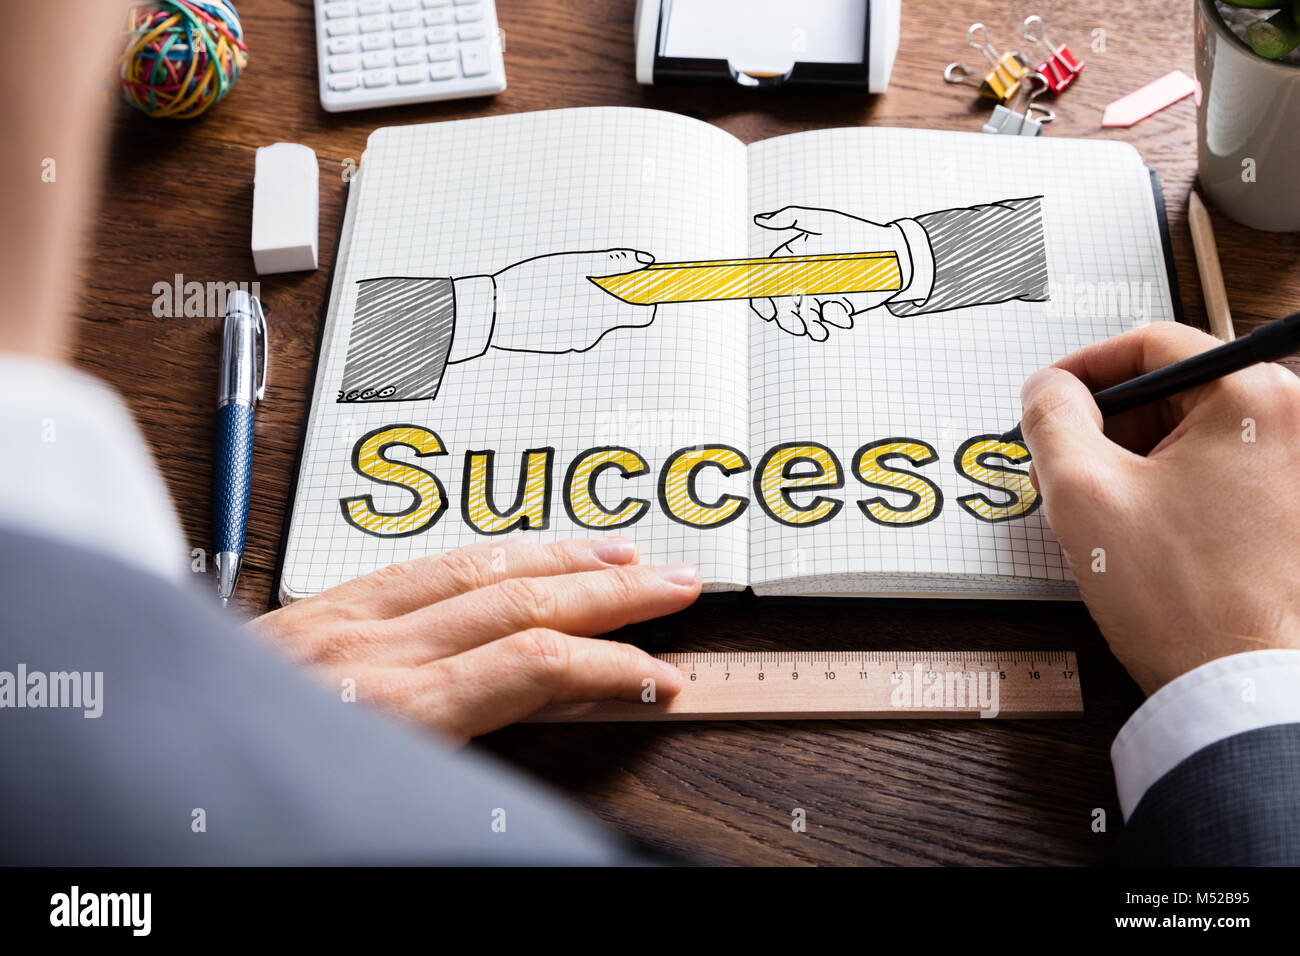 Man Drawing Relay Baton And Success Concept - Stock Image